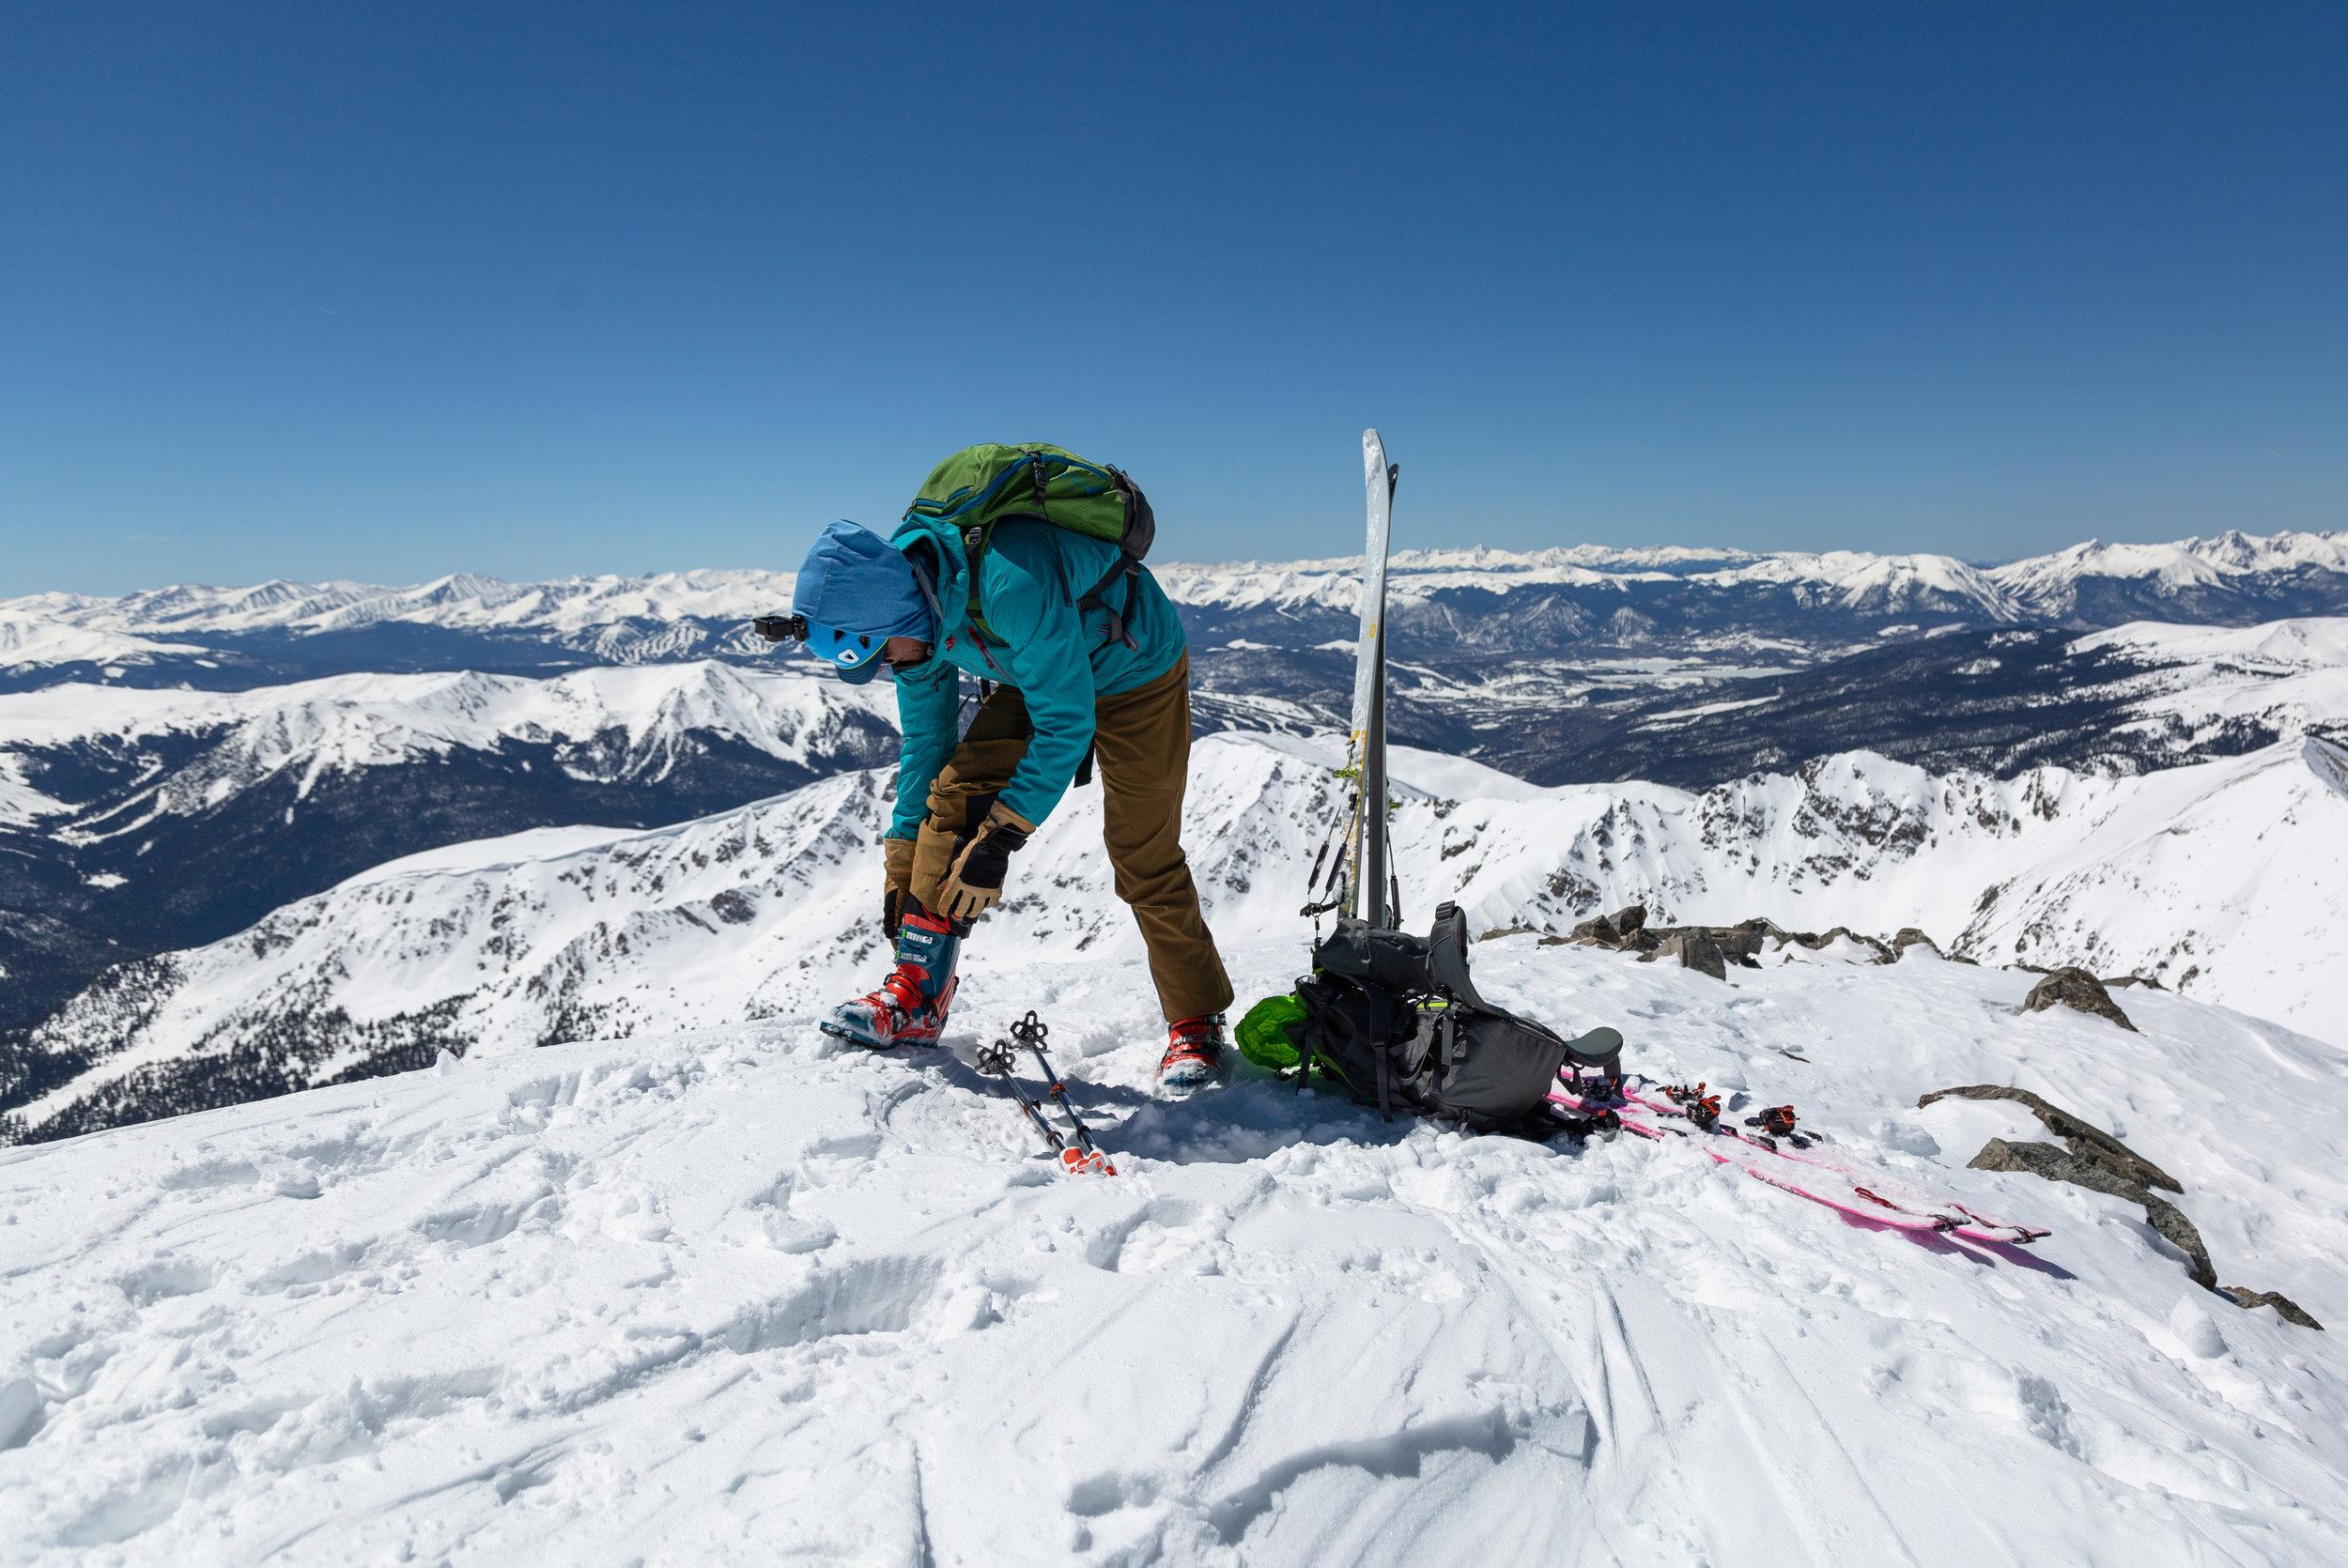 JTG_Skiing-9.jpg